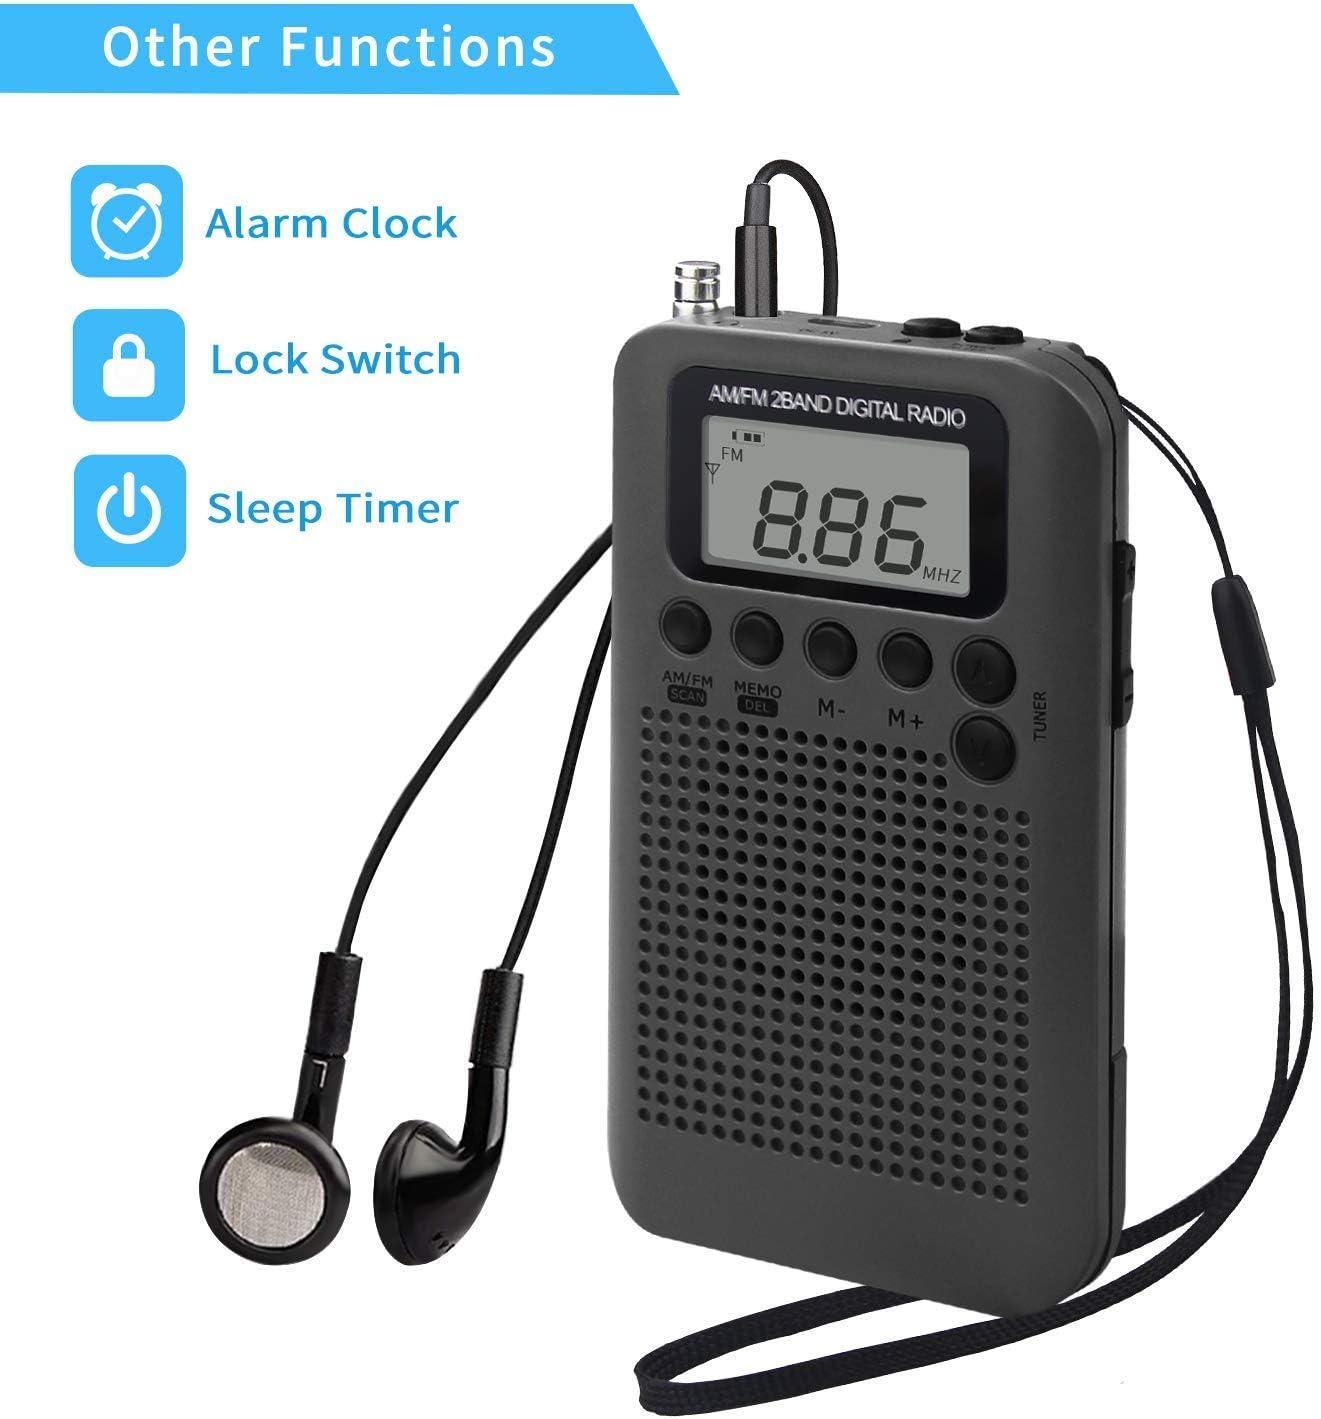 Gold Running Travel Songway AM//FM Pocket Digital Radio Alarm Clocks Sleep Timer Built-In Loudspeaker Portable Small Radio with Earphone for Outdoor Hiking